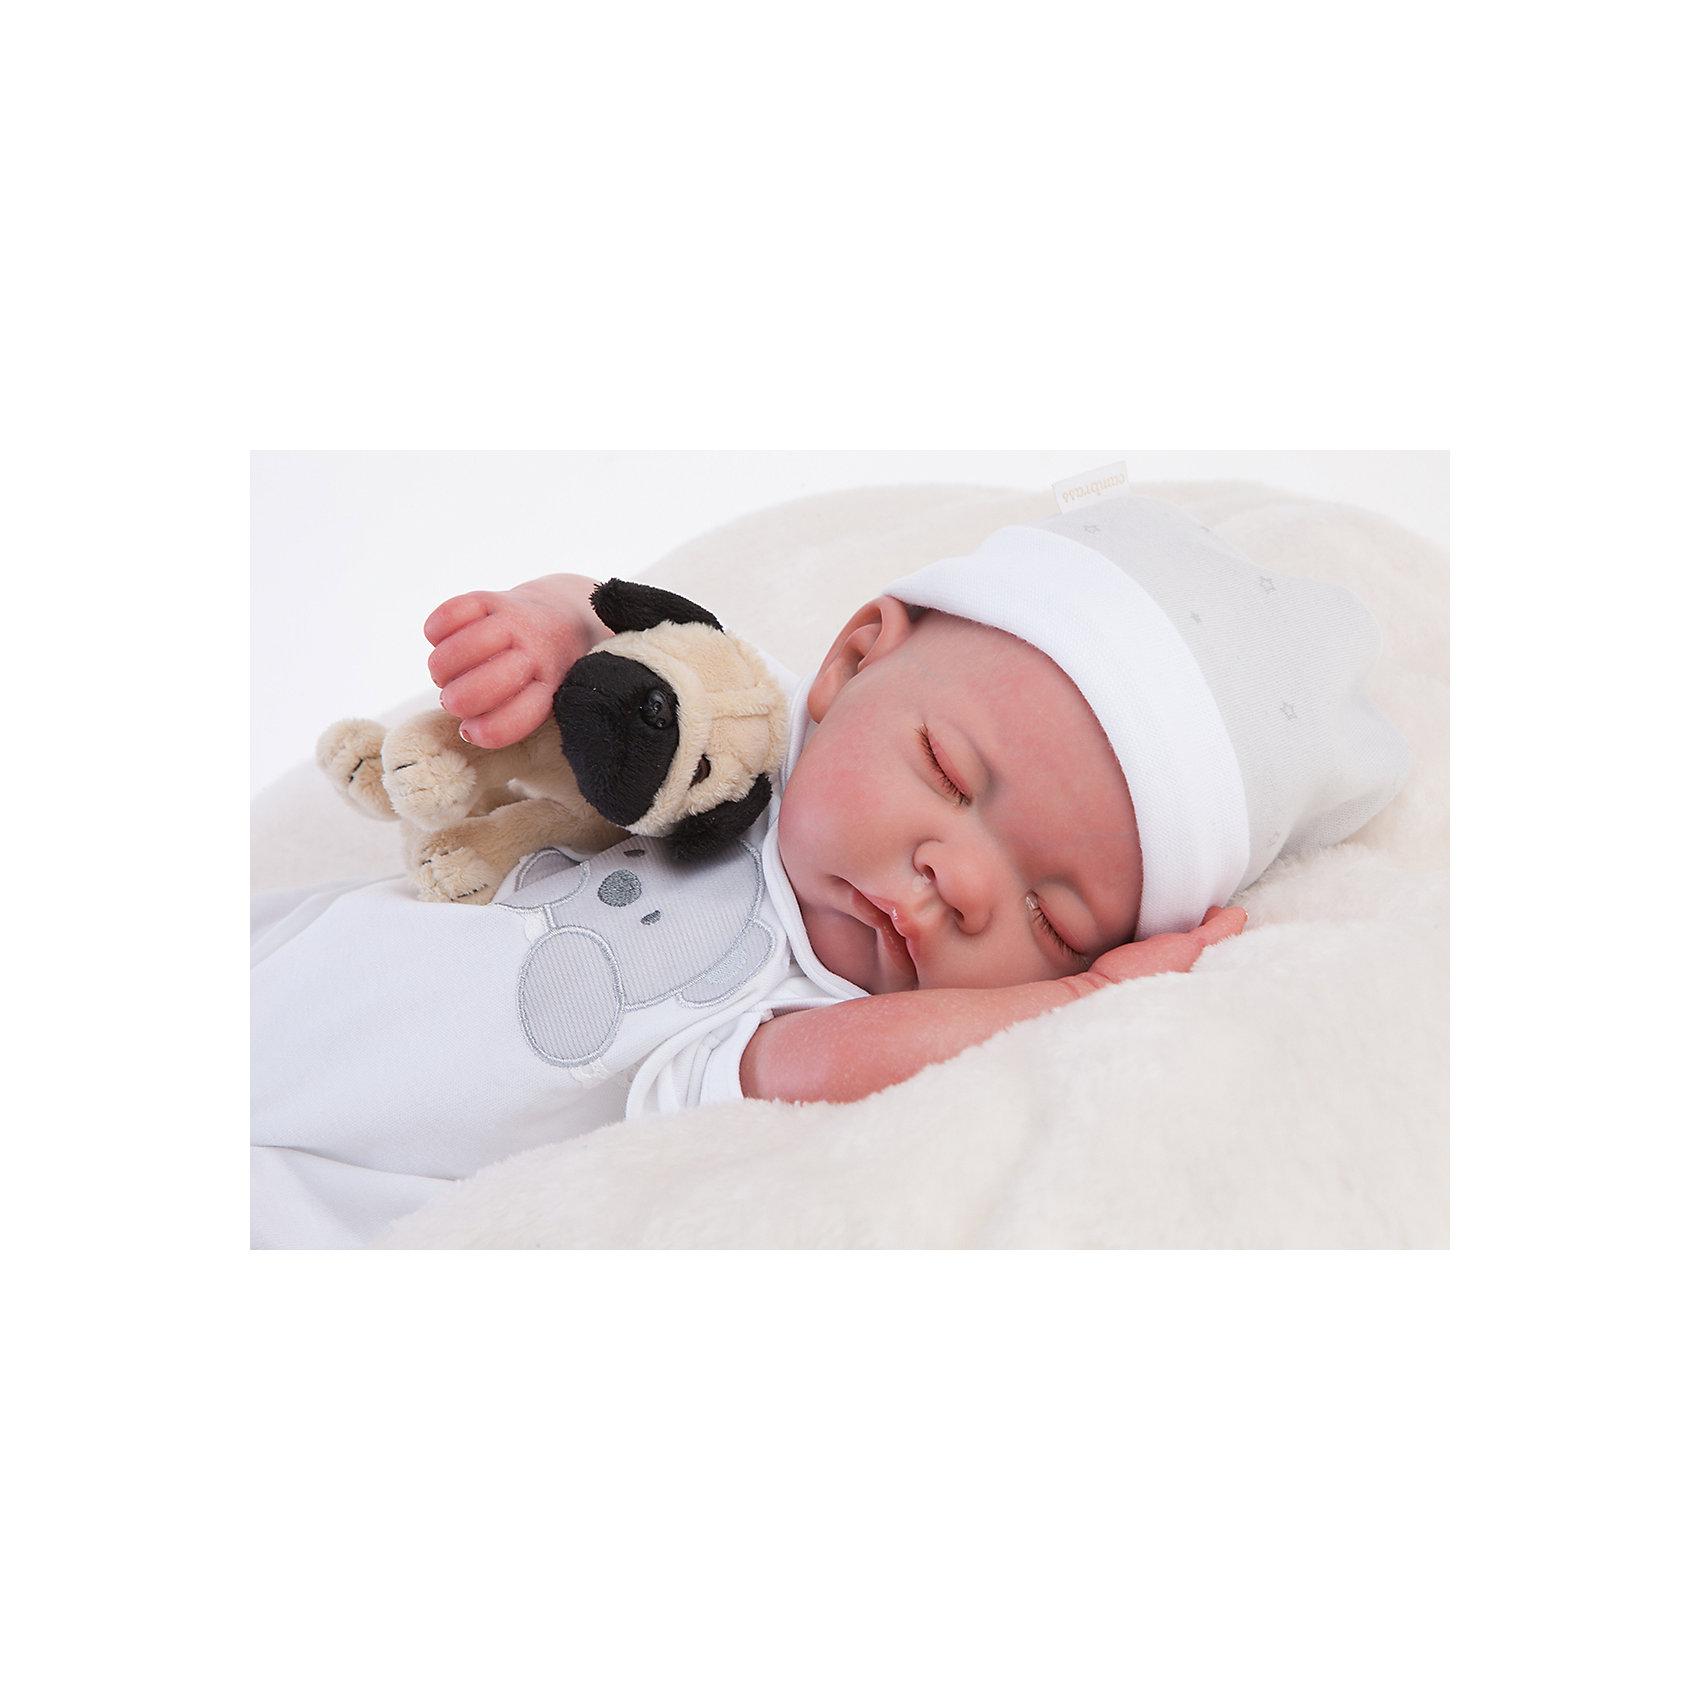 Кукла Реборн младенец Рамон, спящий, 40см, Munecas Antonio JuanКлассические куклы<br><br><br>Ширина мм: 200<br>Глубина мм: 280<br>Высота мм: 550<br>Вес г: 3650<br>Возраст от месяцев: 36<br>Возраст до месяцев: 2147483647<br>Пол: Женский<br>Возраст: Детский<br>SKU: 6886592